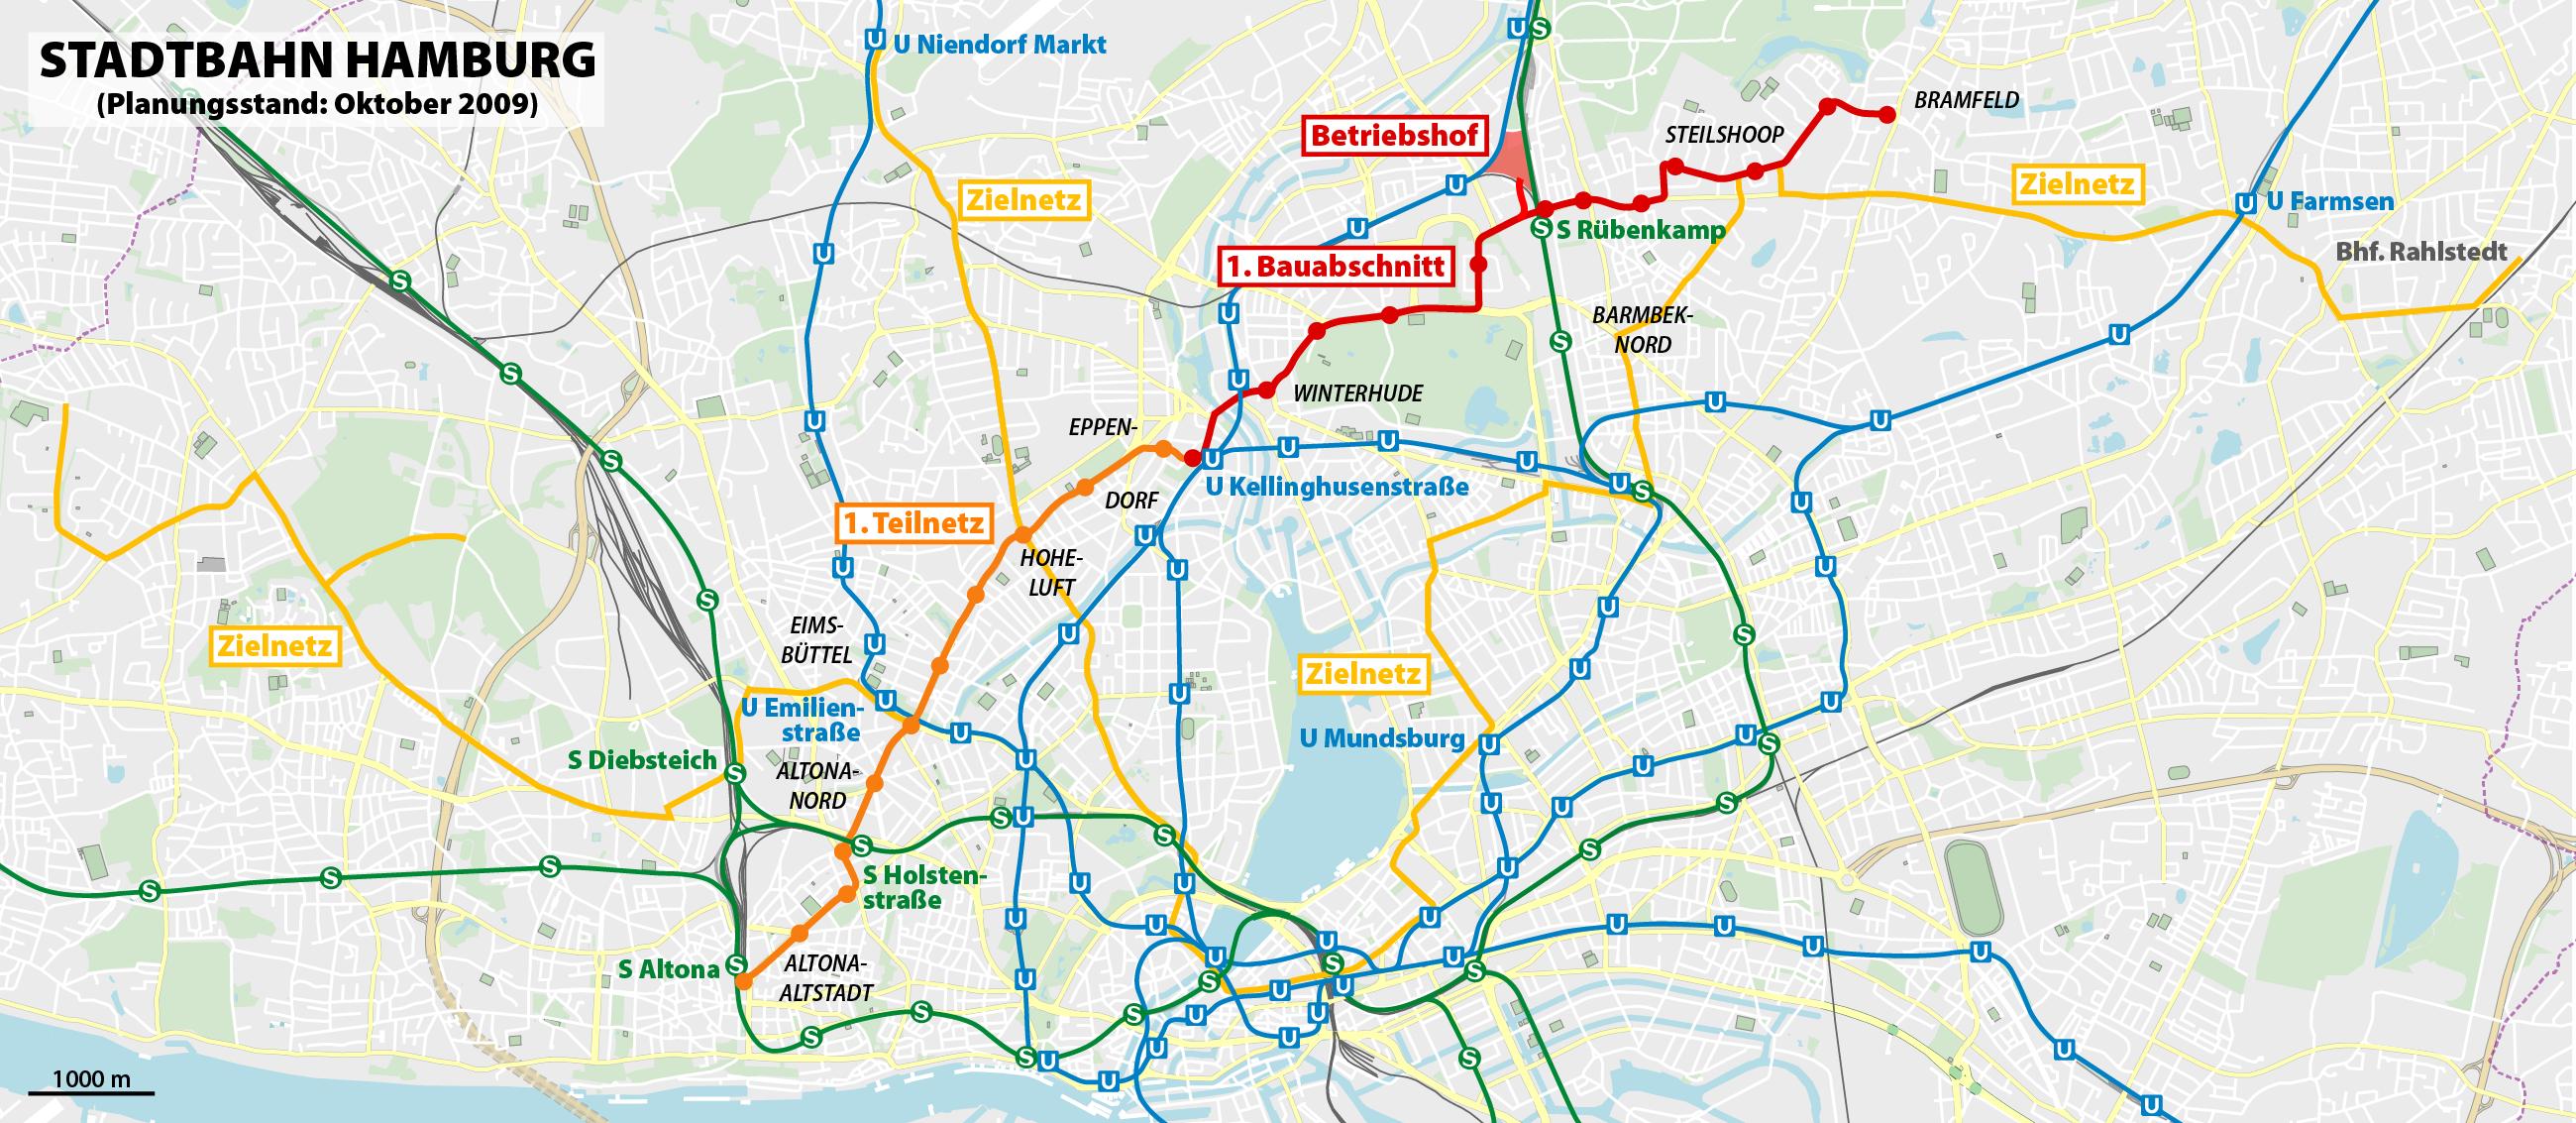 öpnv hamburg karte Stadtbahn Hamburg – Wikipedia